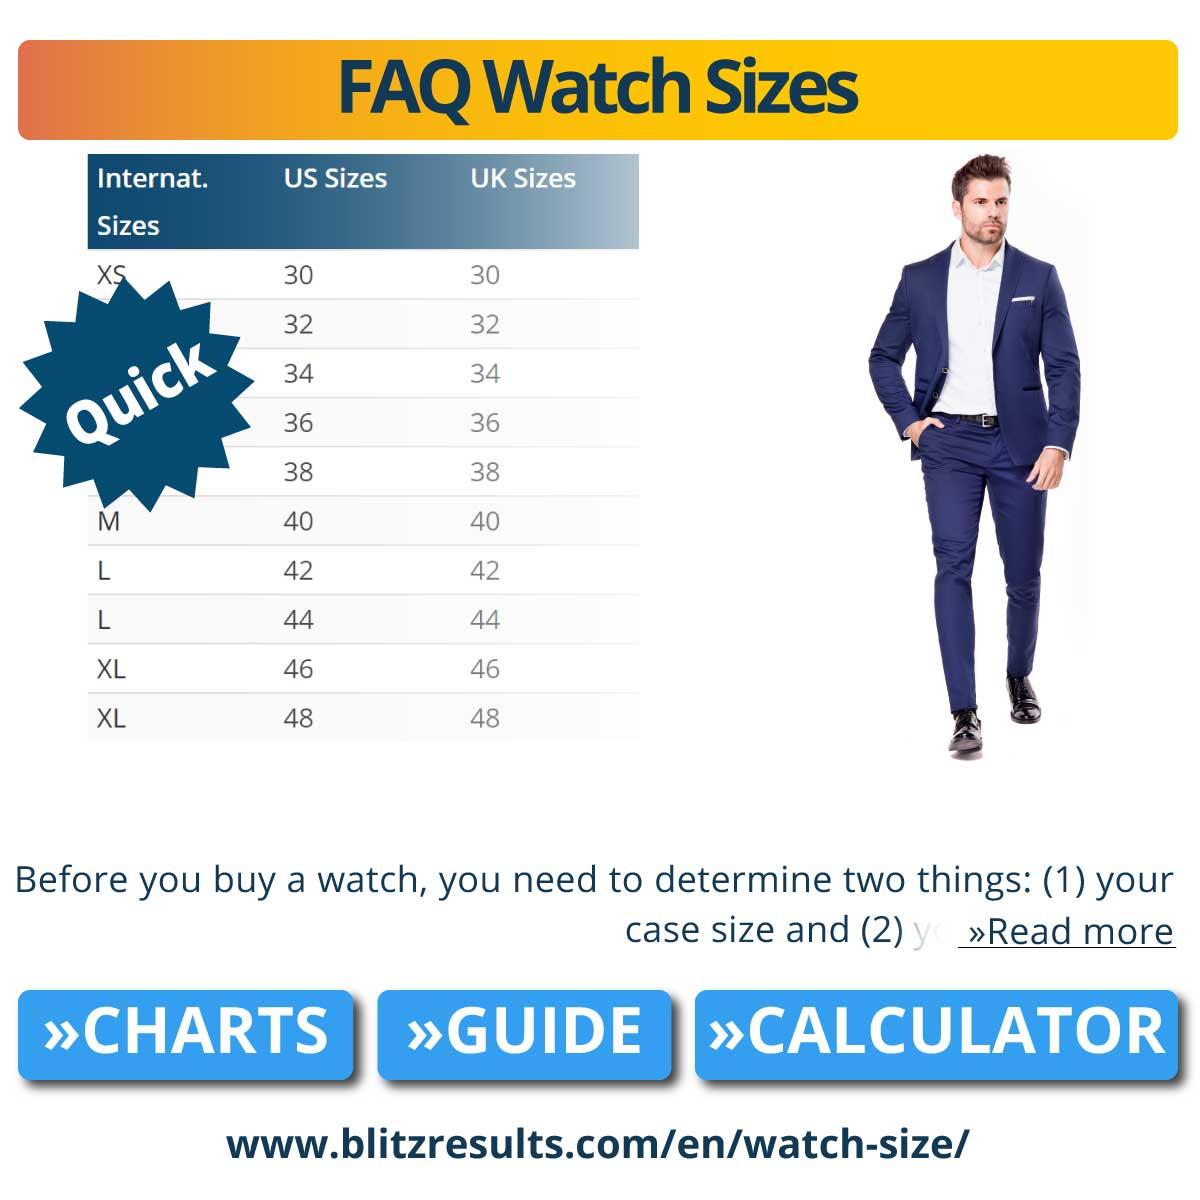 FAQ Watch Sizes